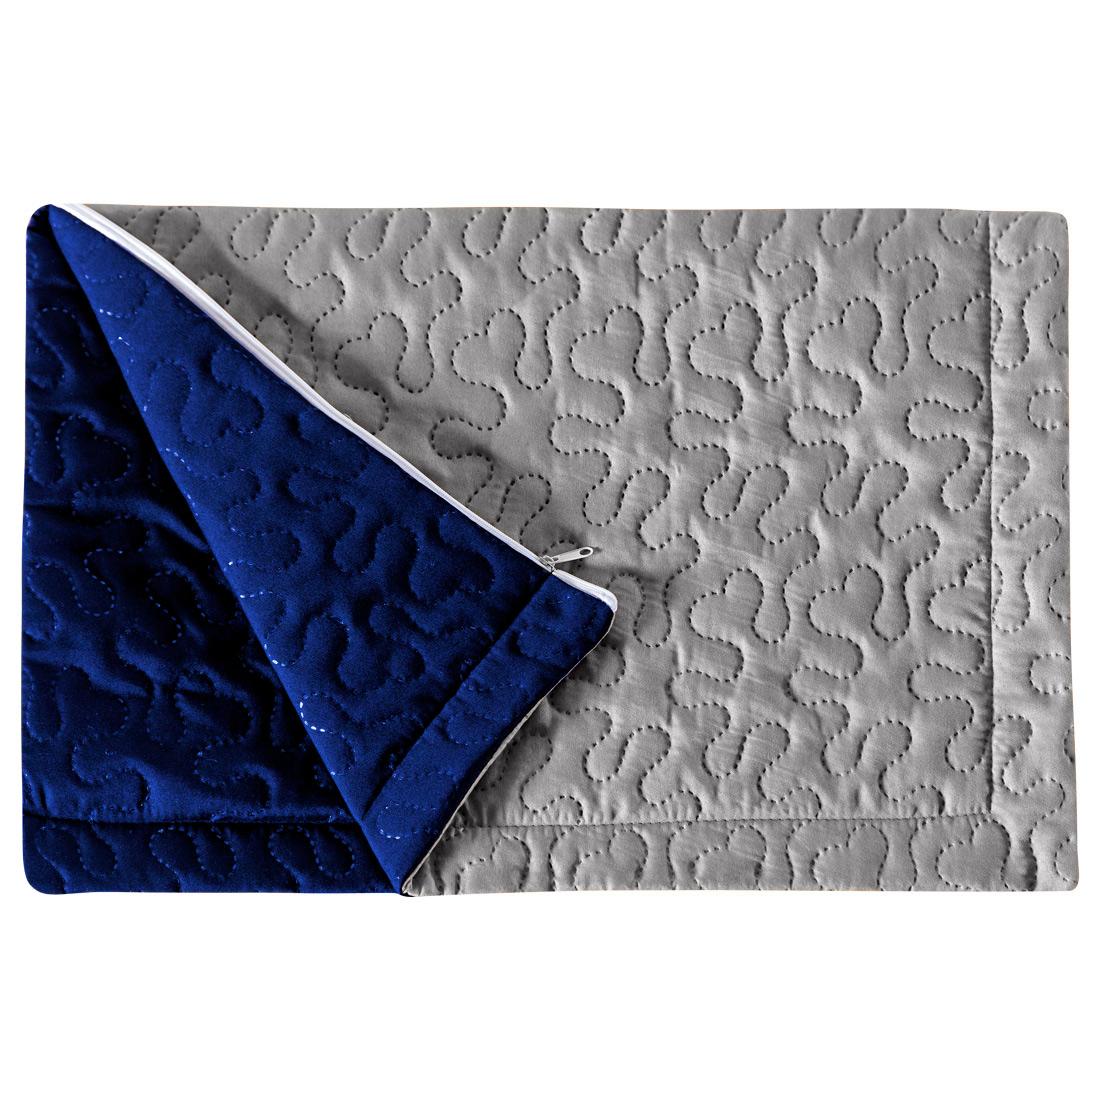 Porta Travesseiro Pratik Cinza/Azul Royal Avulso Dupla Face c/ Zíper - Microfibra